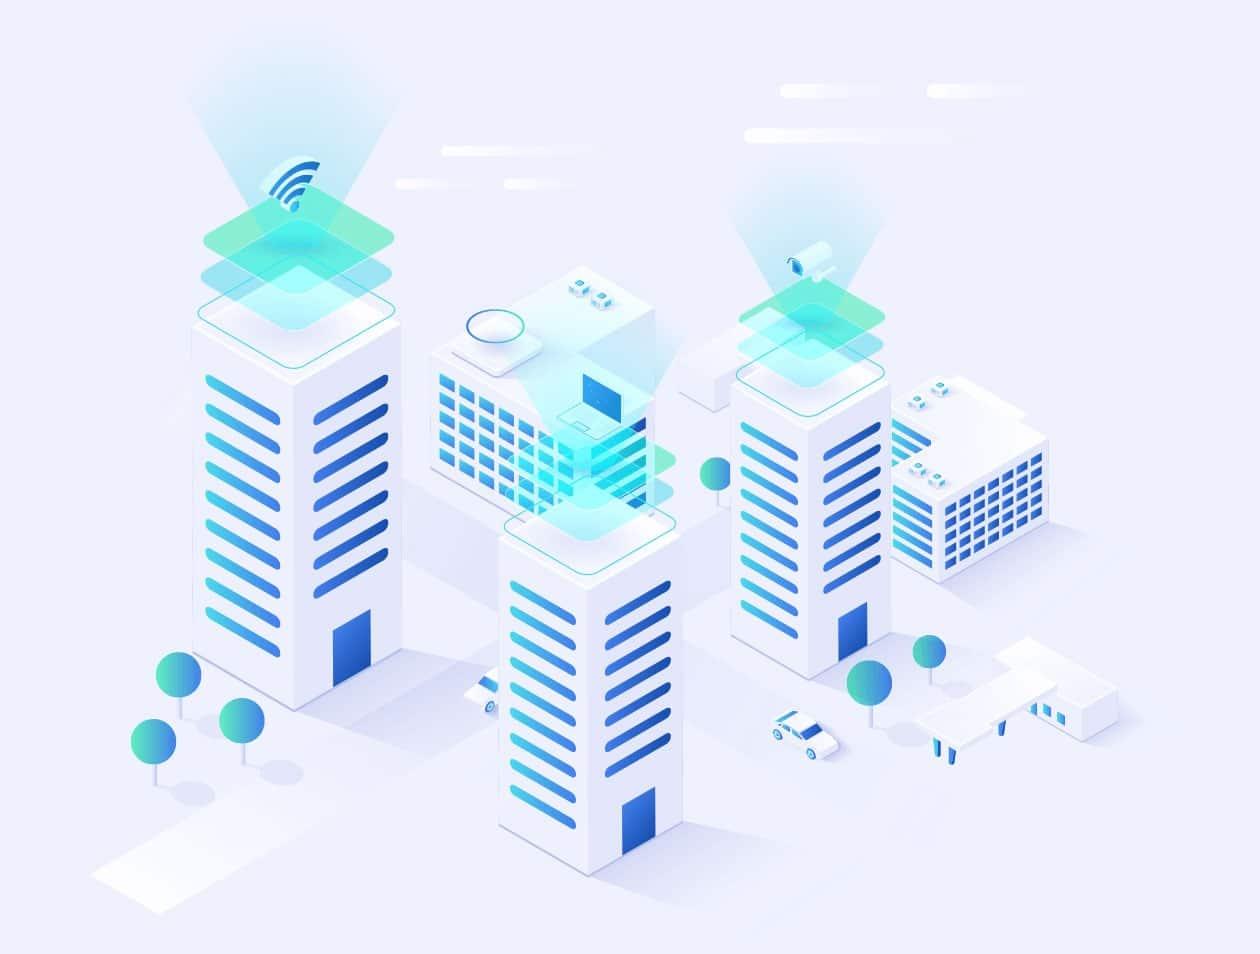 02 - Business Intelligence